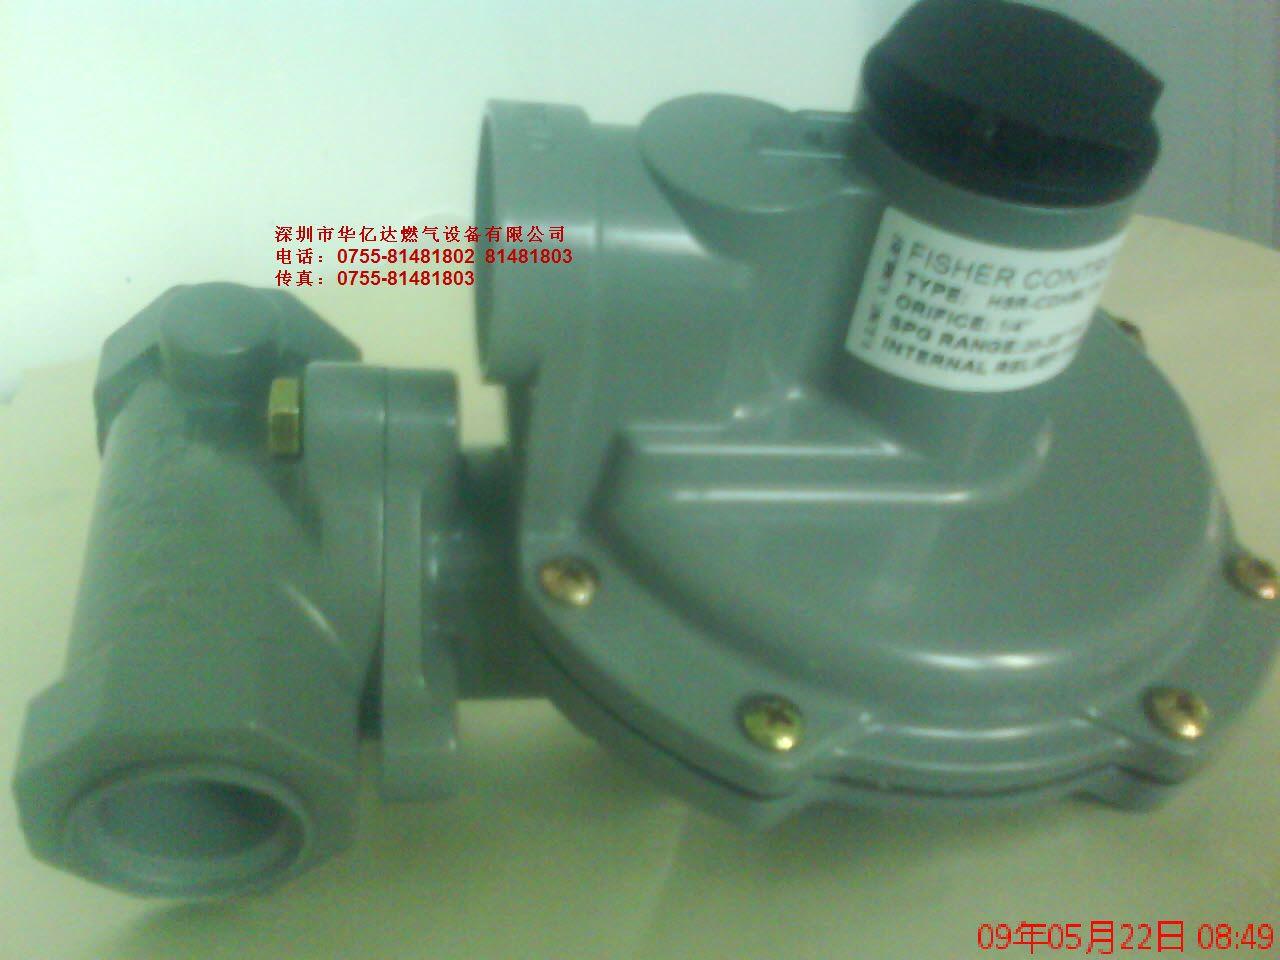 供应Fisher品牌LOC870 、03MAR11液化气减压阀